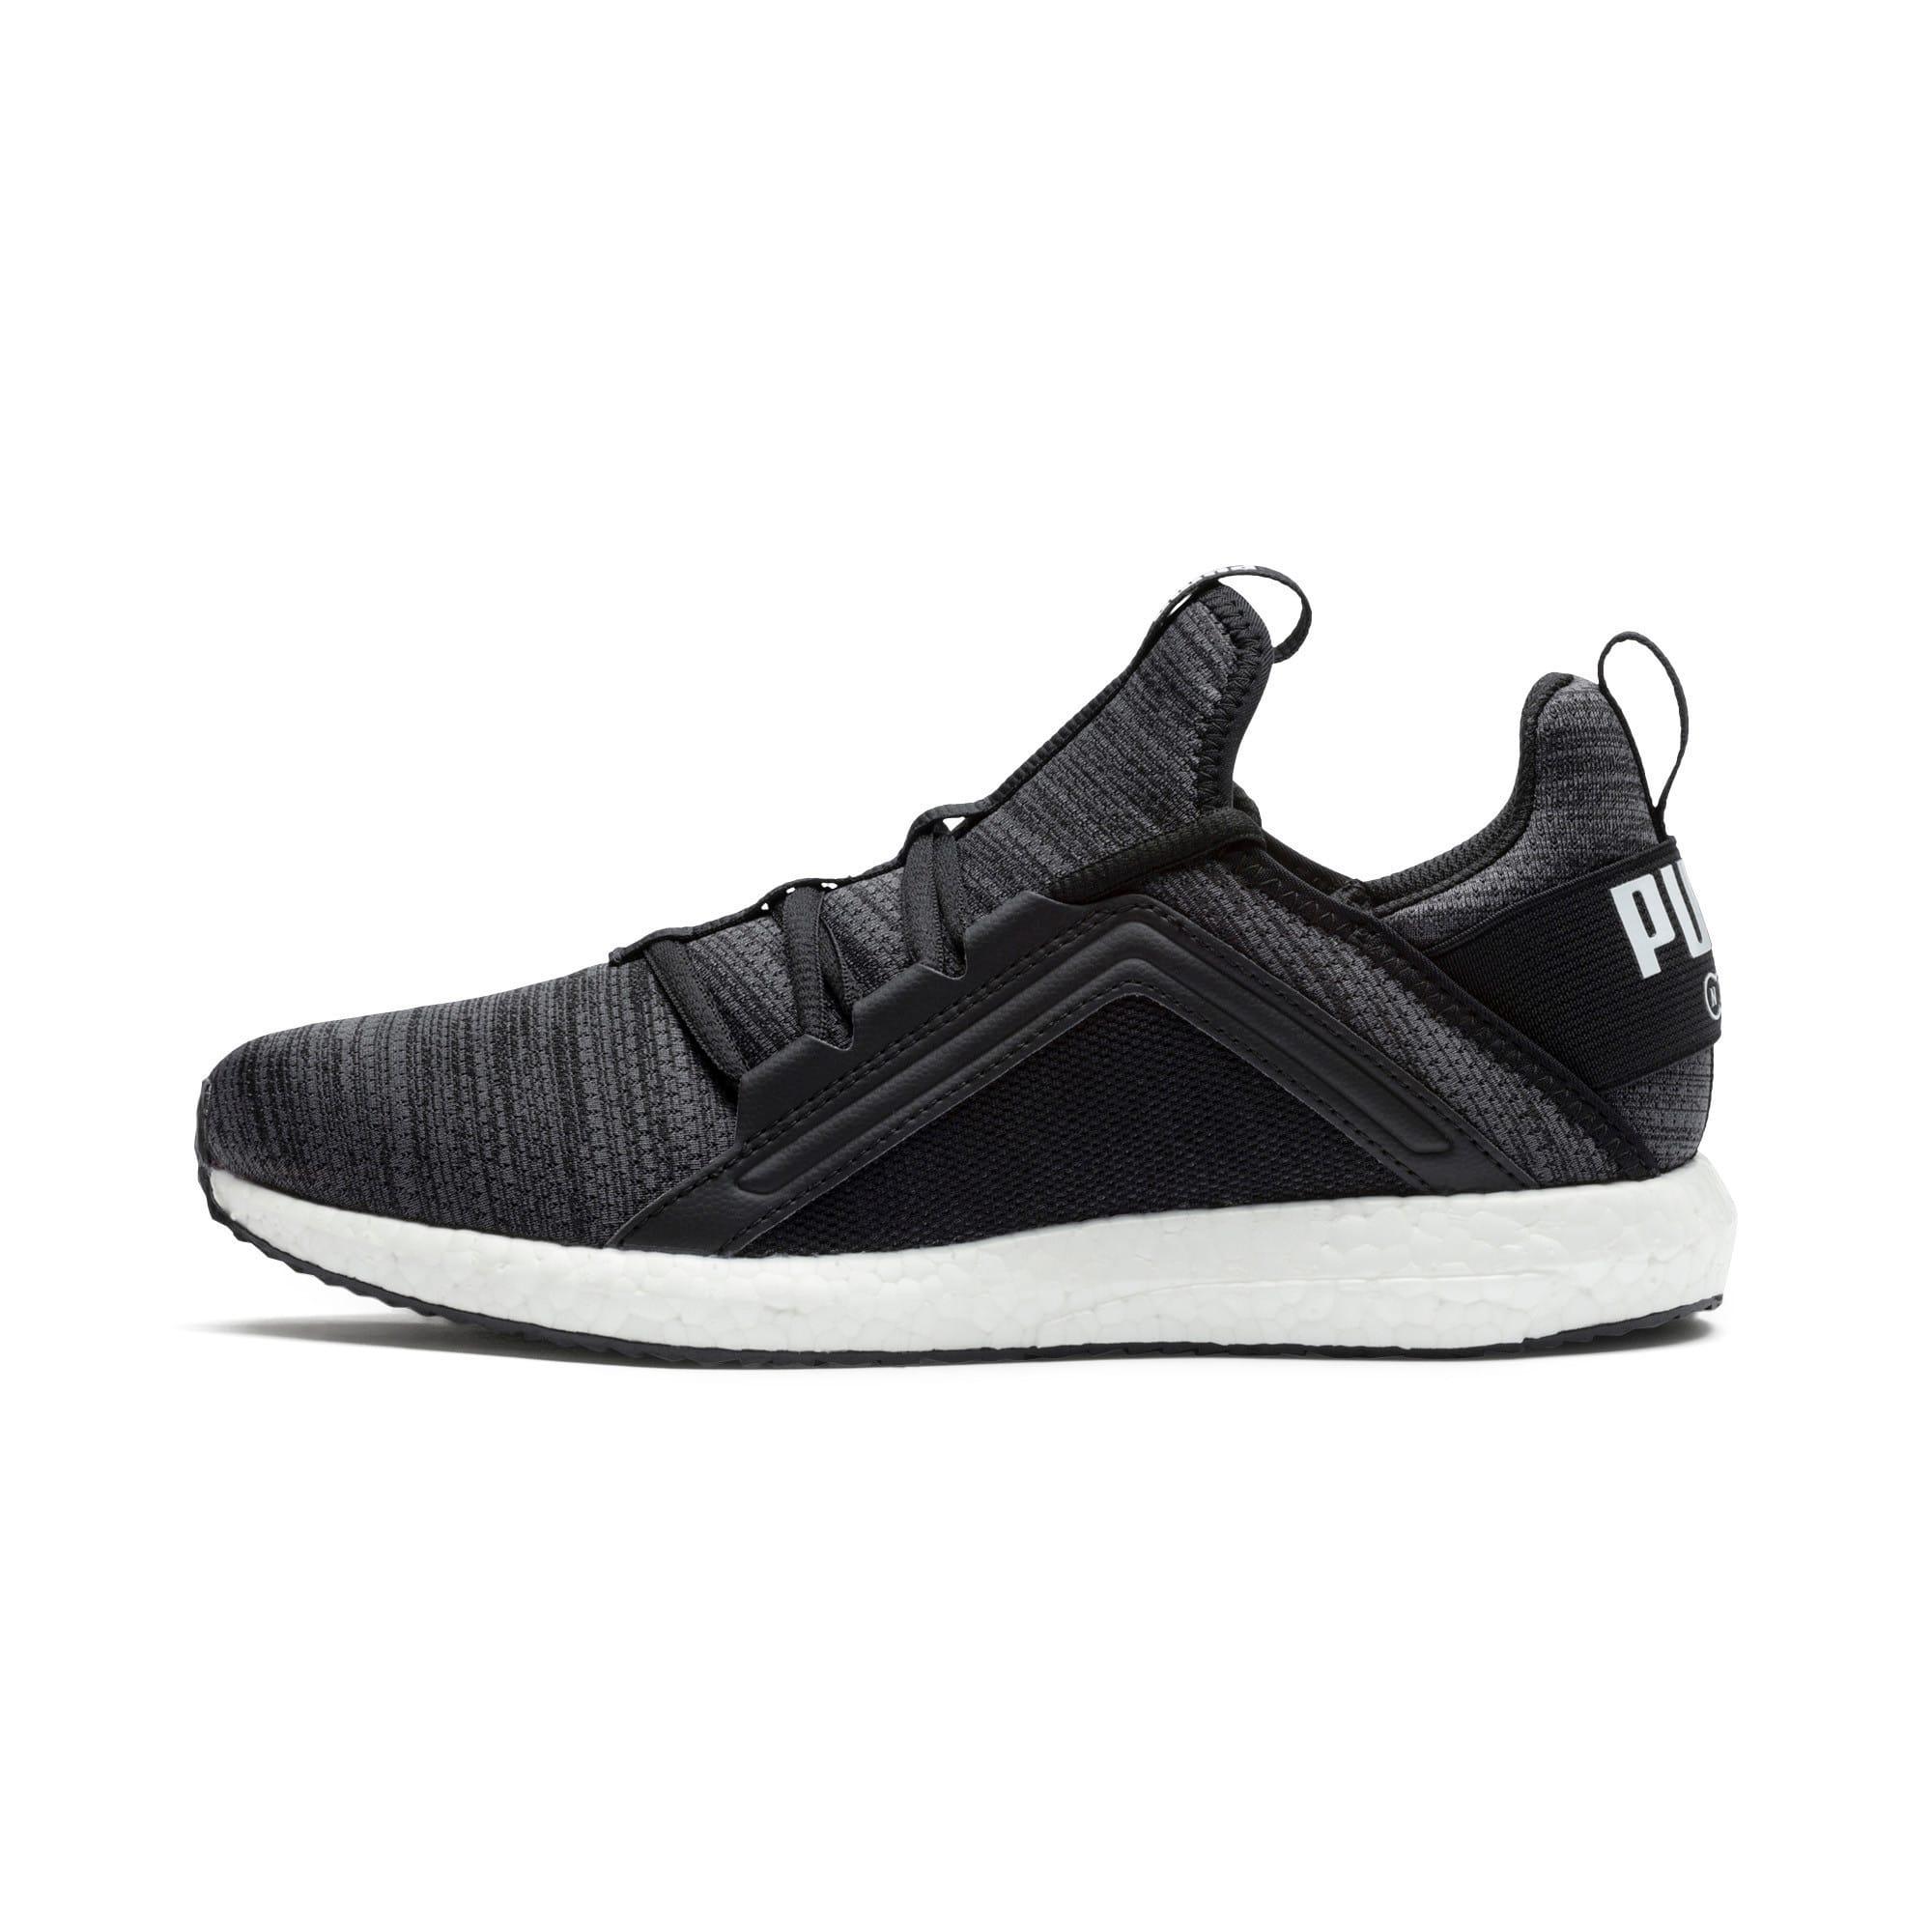 Thumbnail 1 of Mega Energy Heather Knit Women's Running Shoes, Black-Iron Gate-White, medium-IND